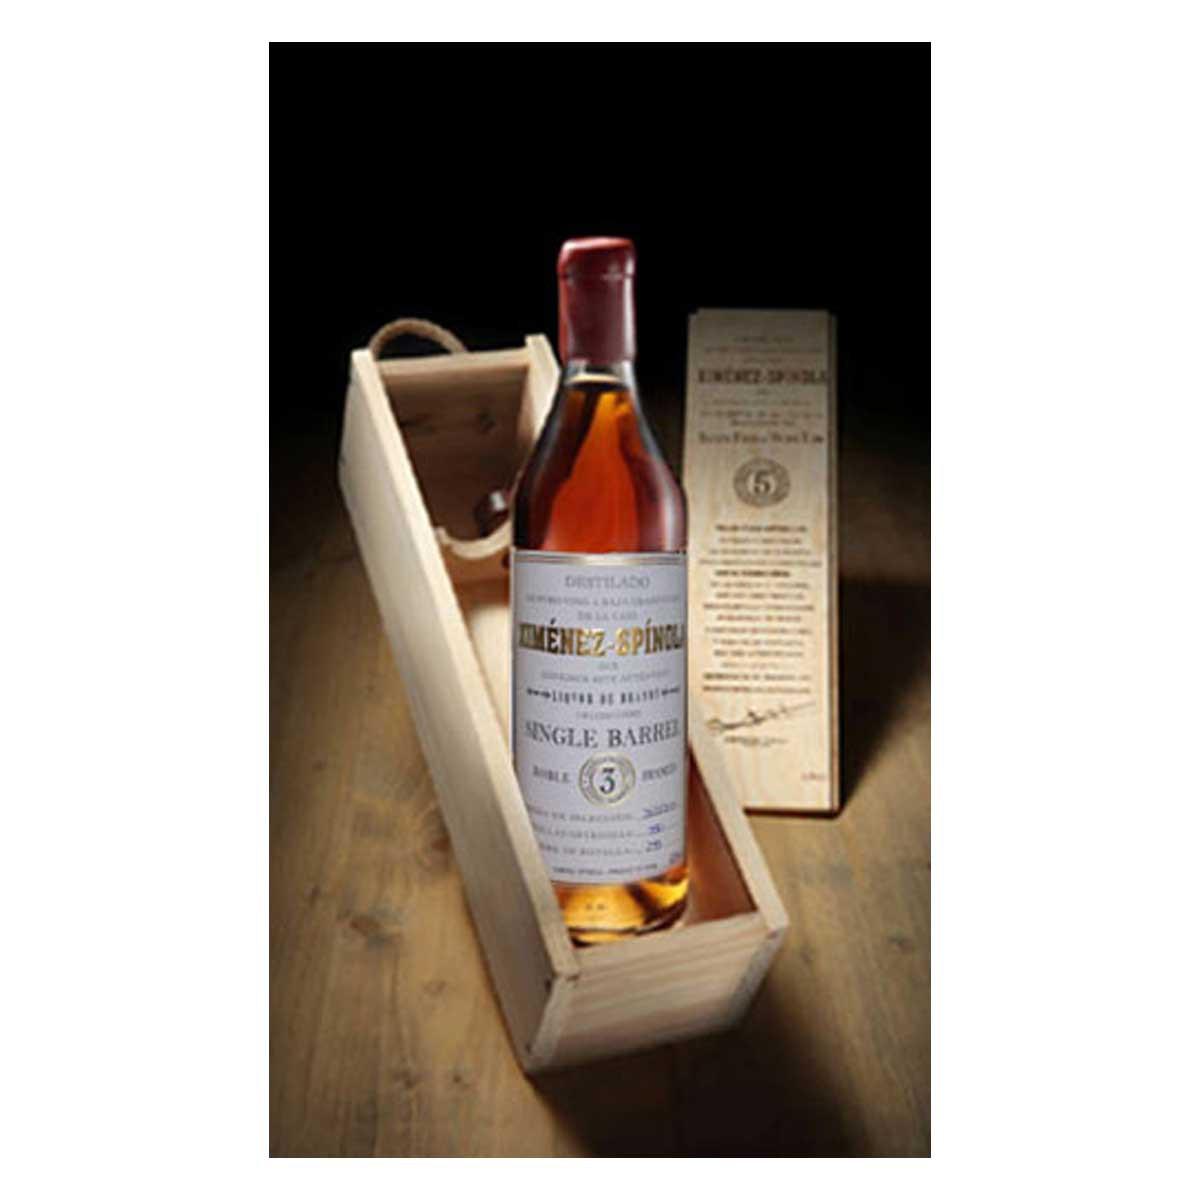 brandy-ximenez-spinola-single-barrel.jpg